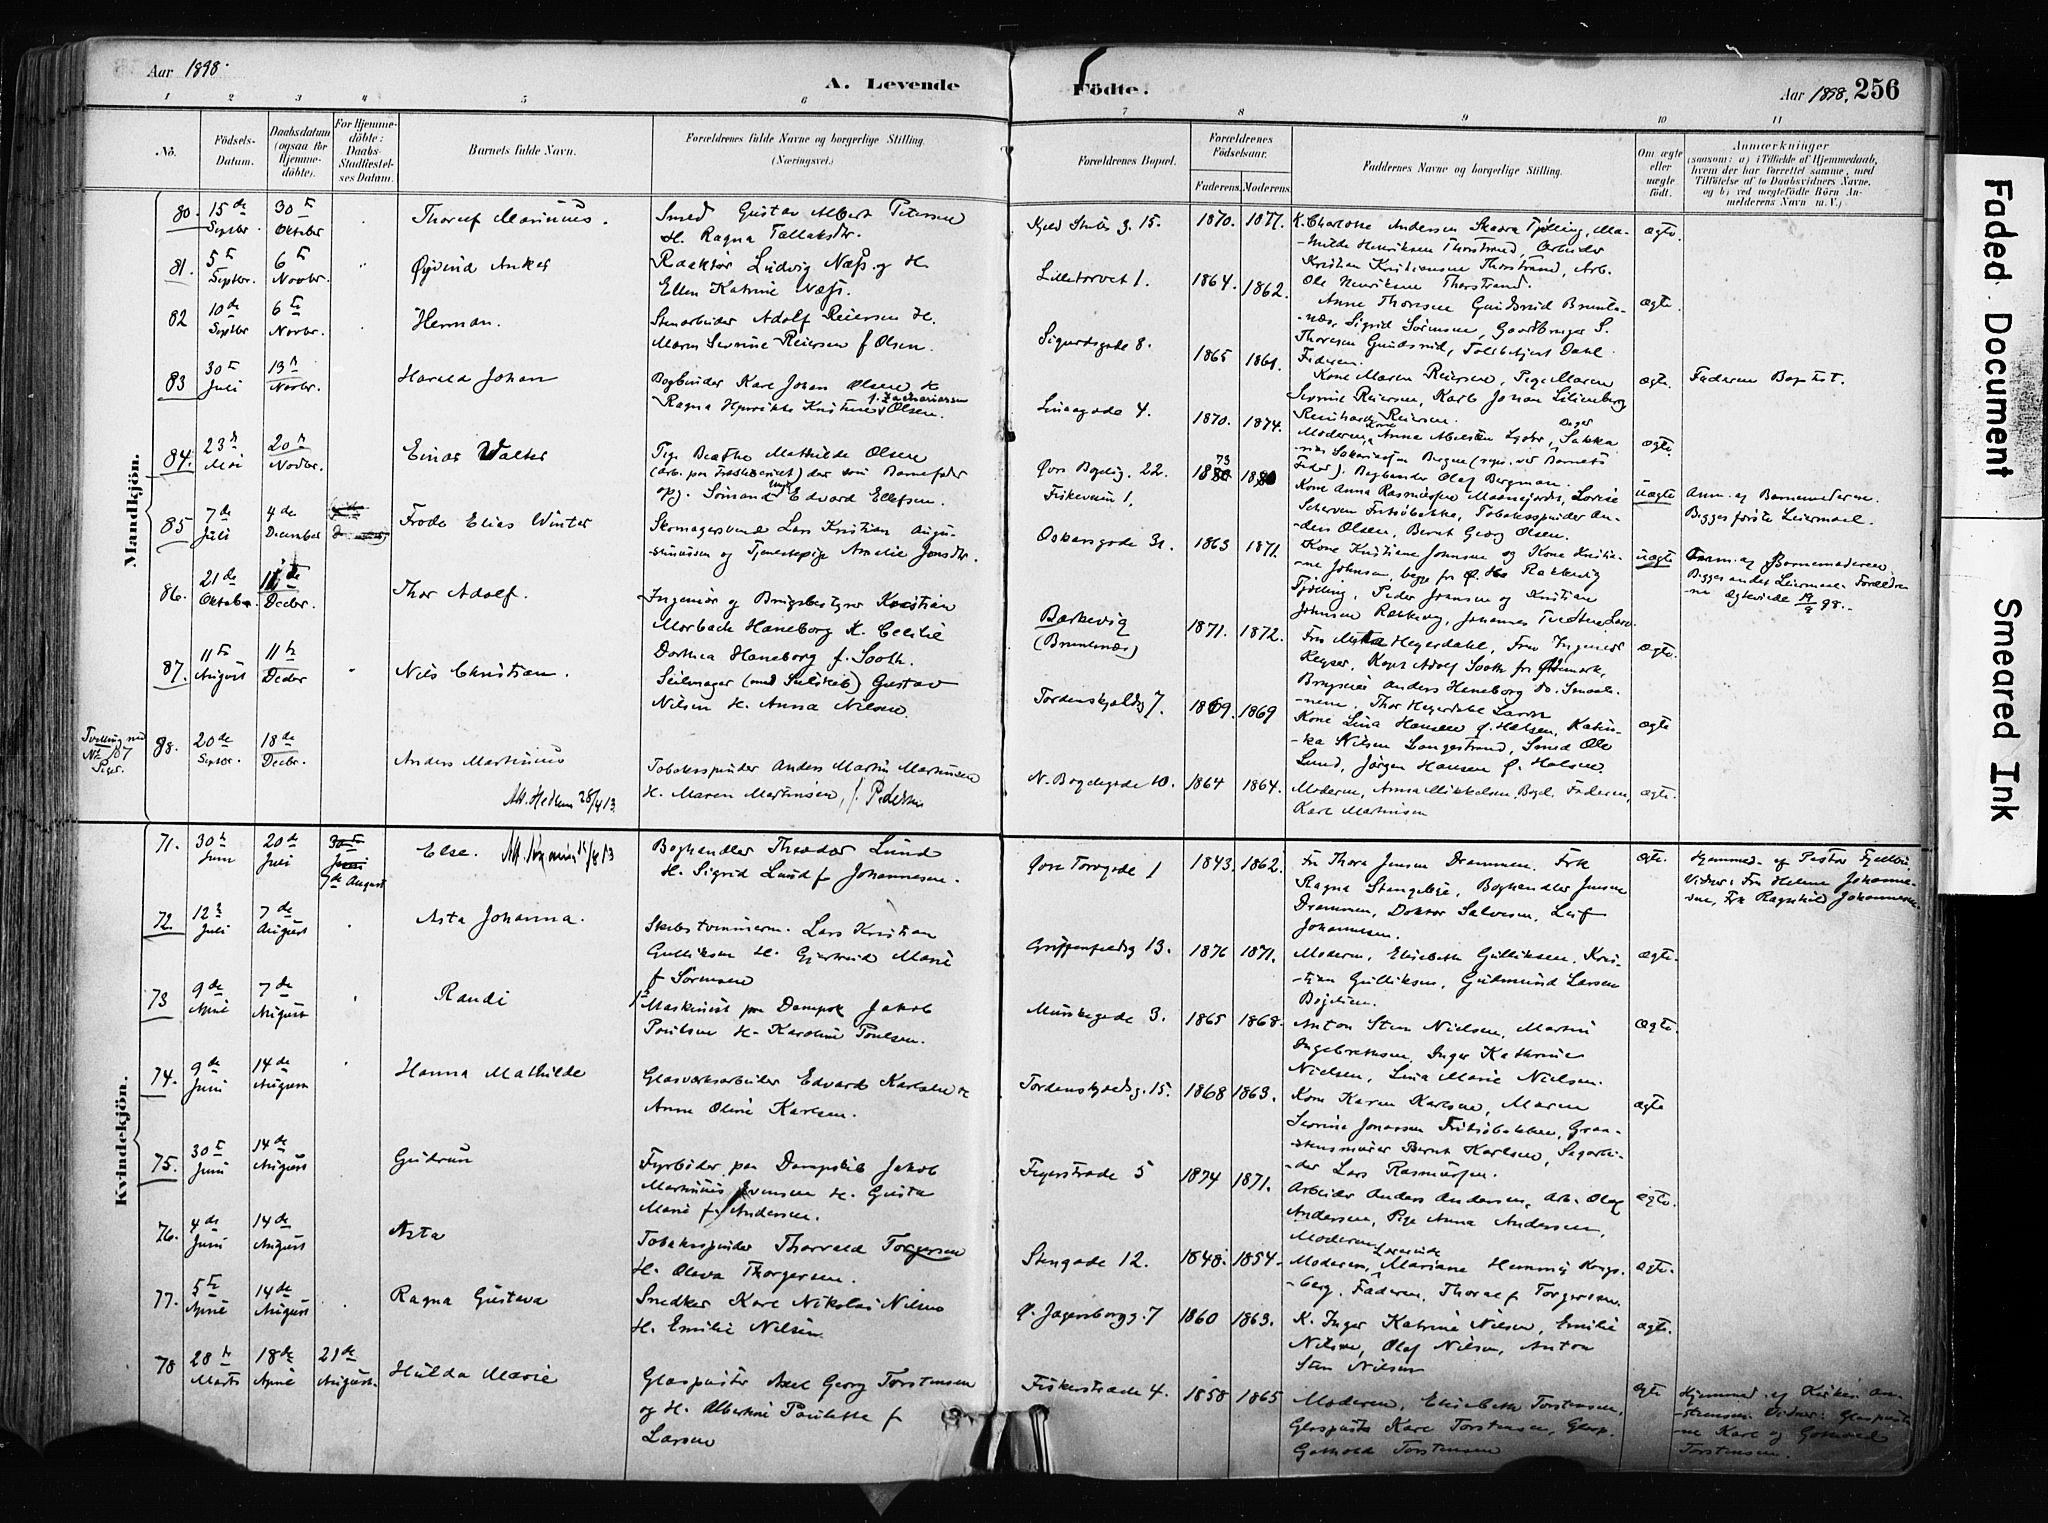 SAKO, Larvik kirkebøker, F/Fa/L0009: Ministerialbok nr. I 9, 1884-1904, s. 256